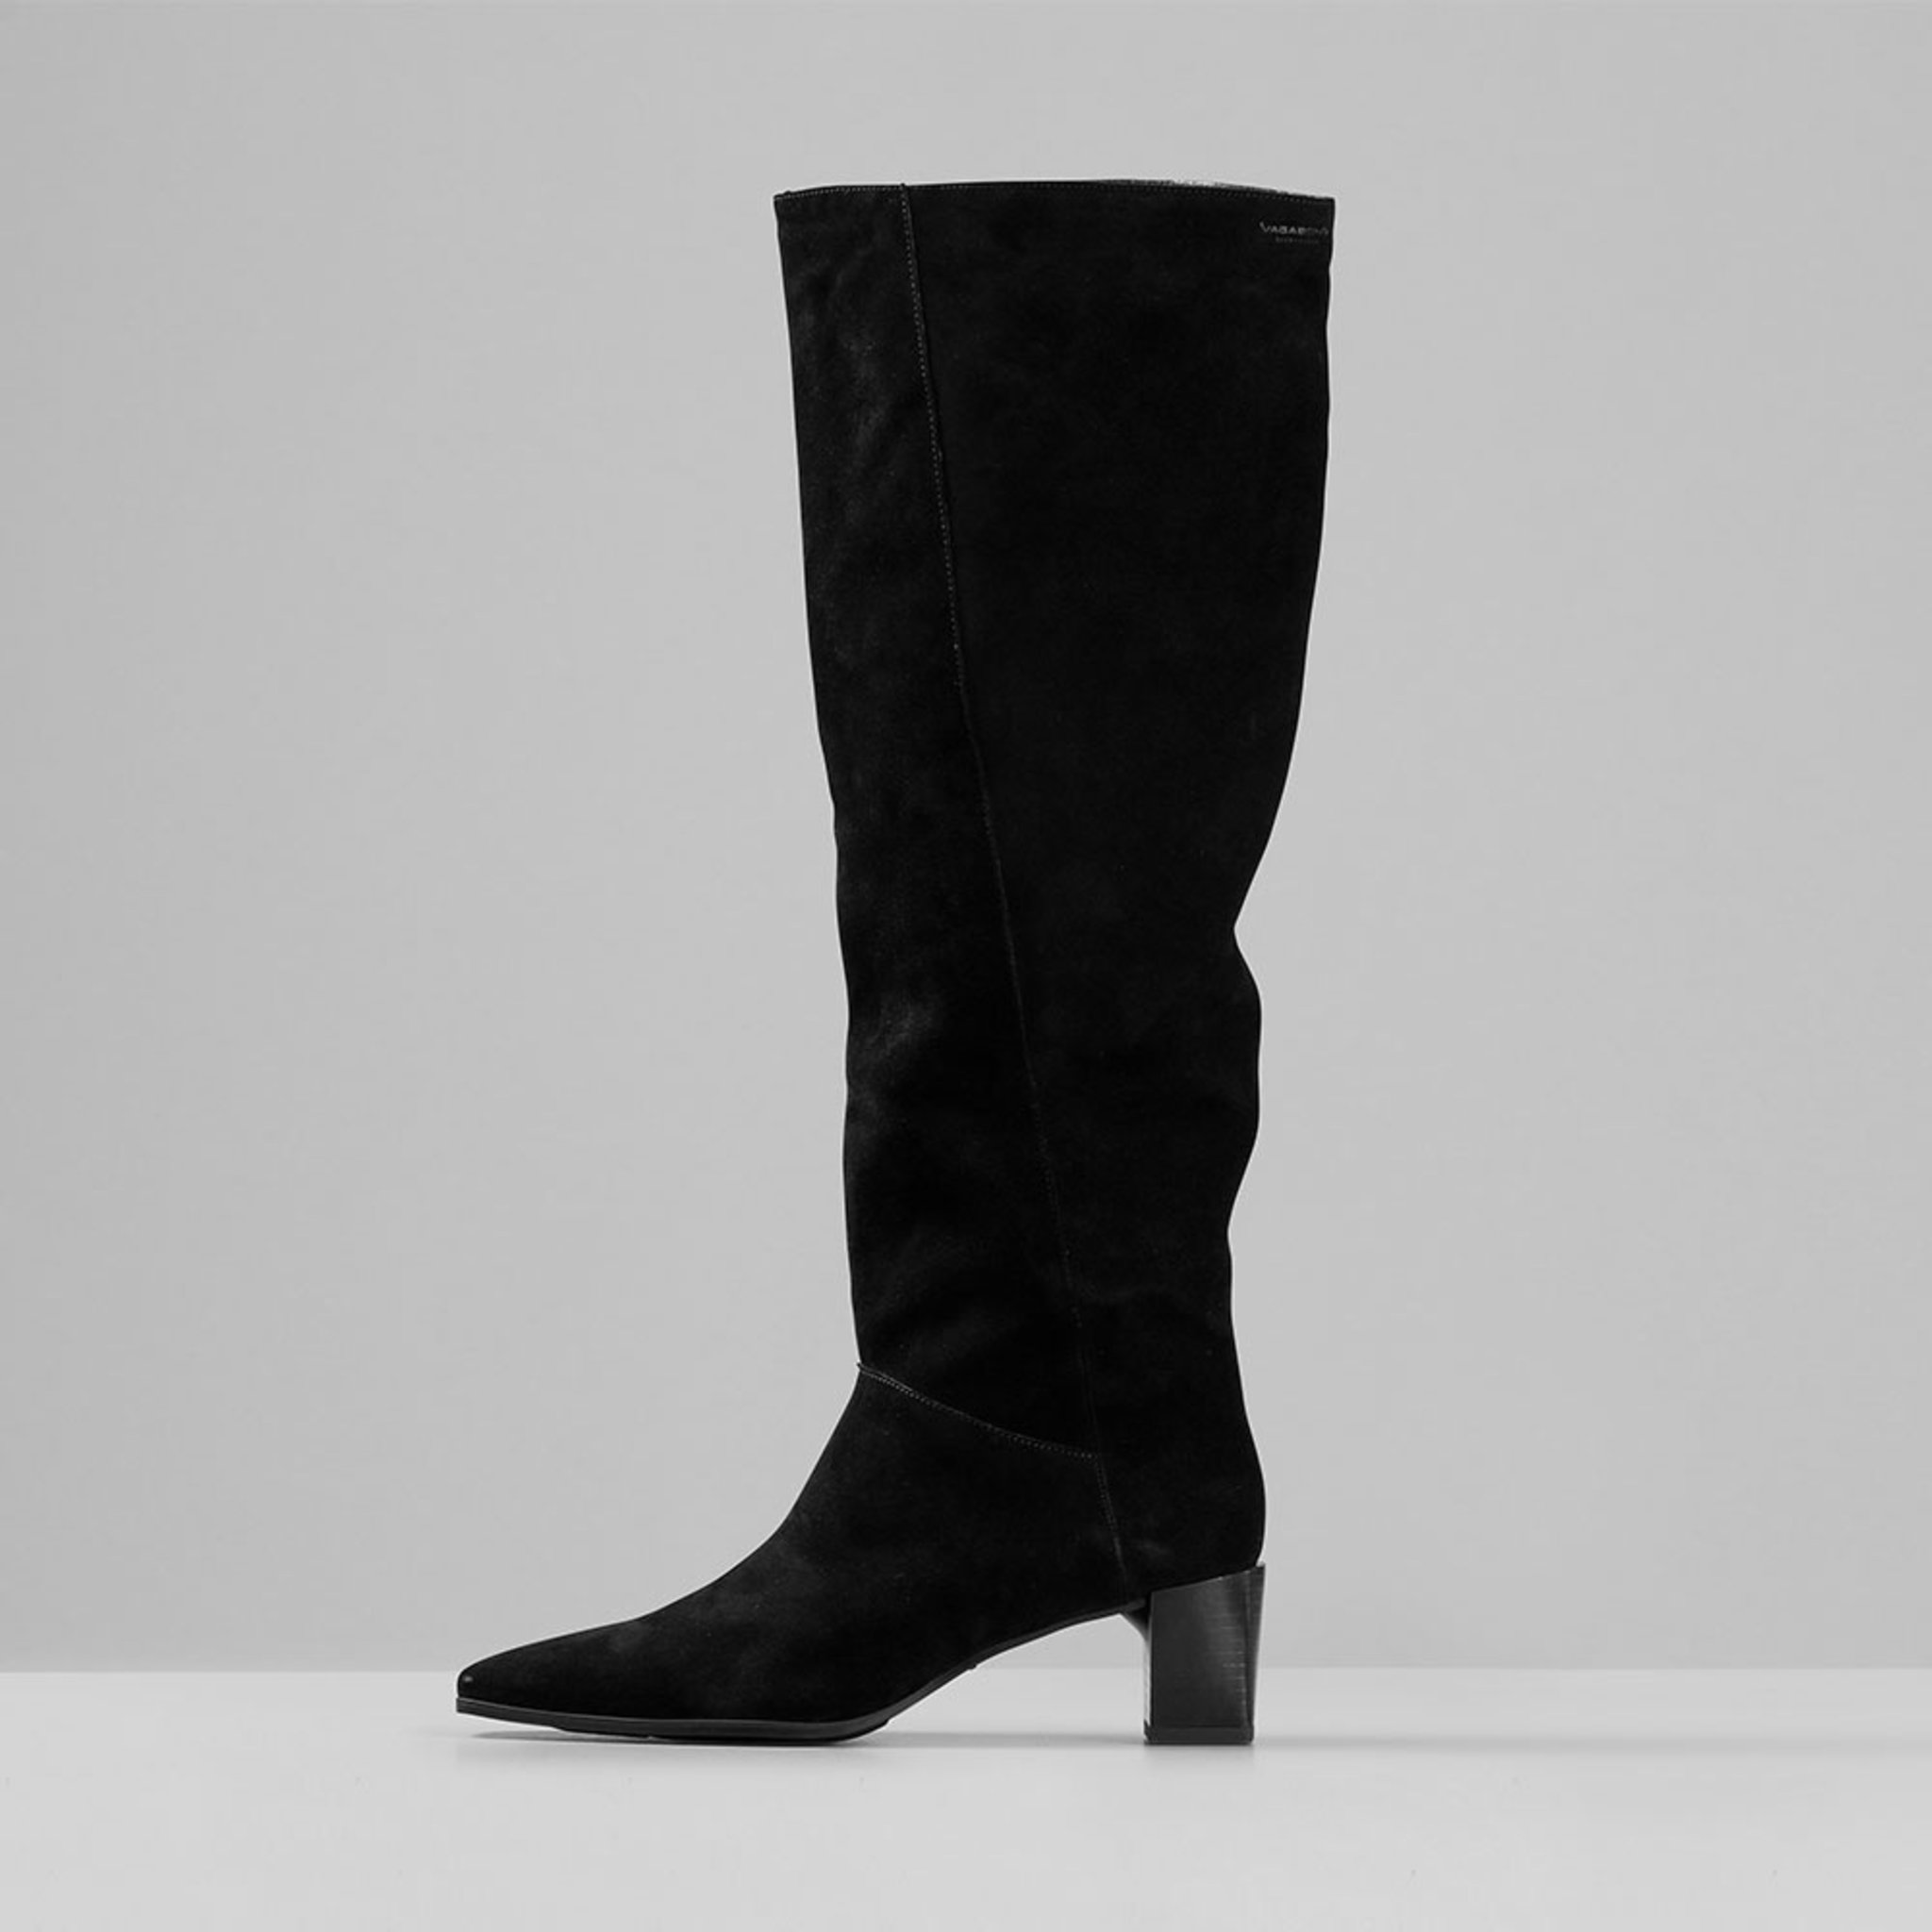 GABI Tall Boots with Heel, svart